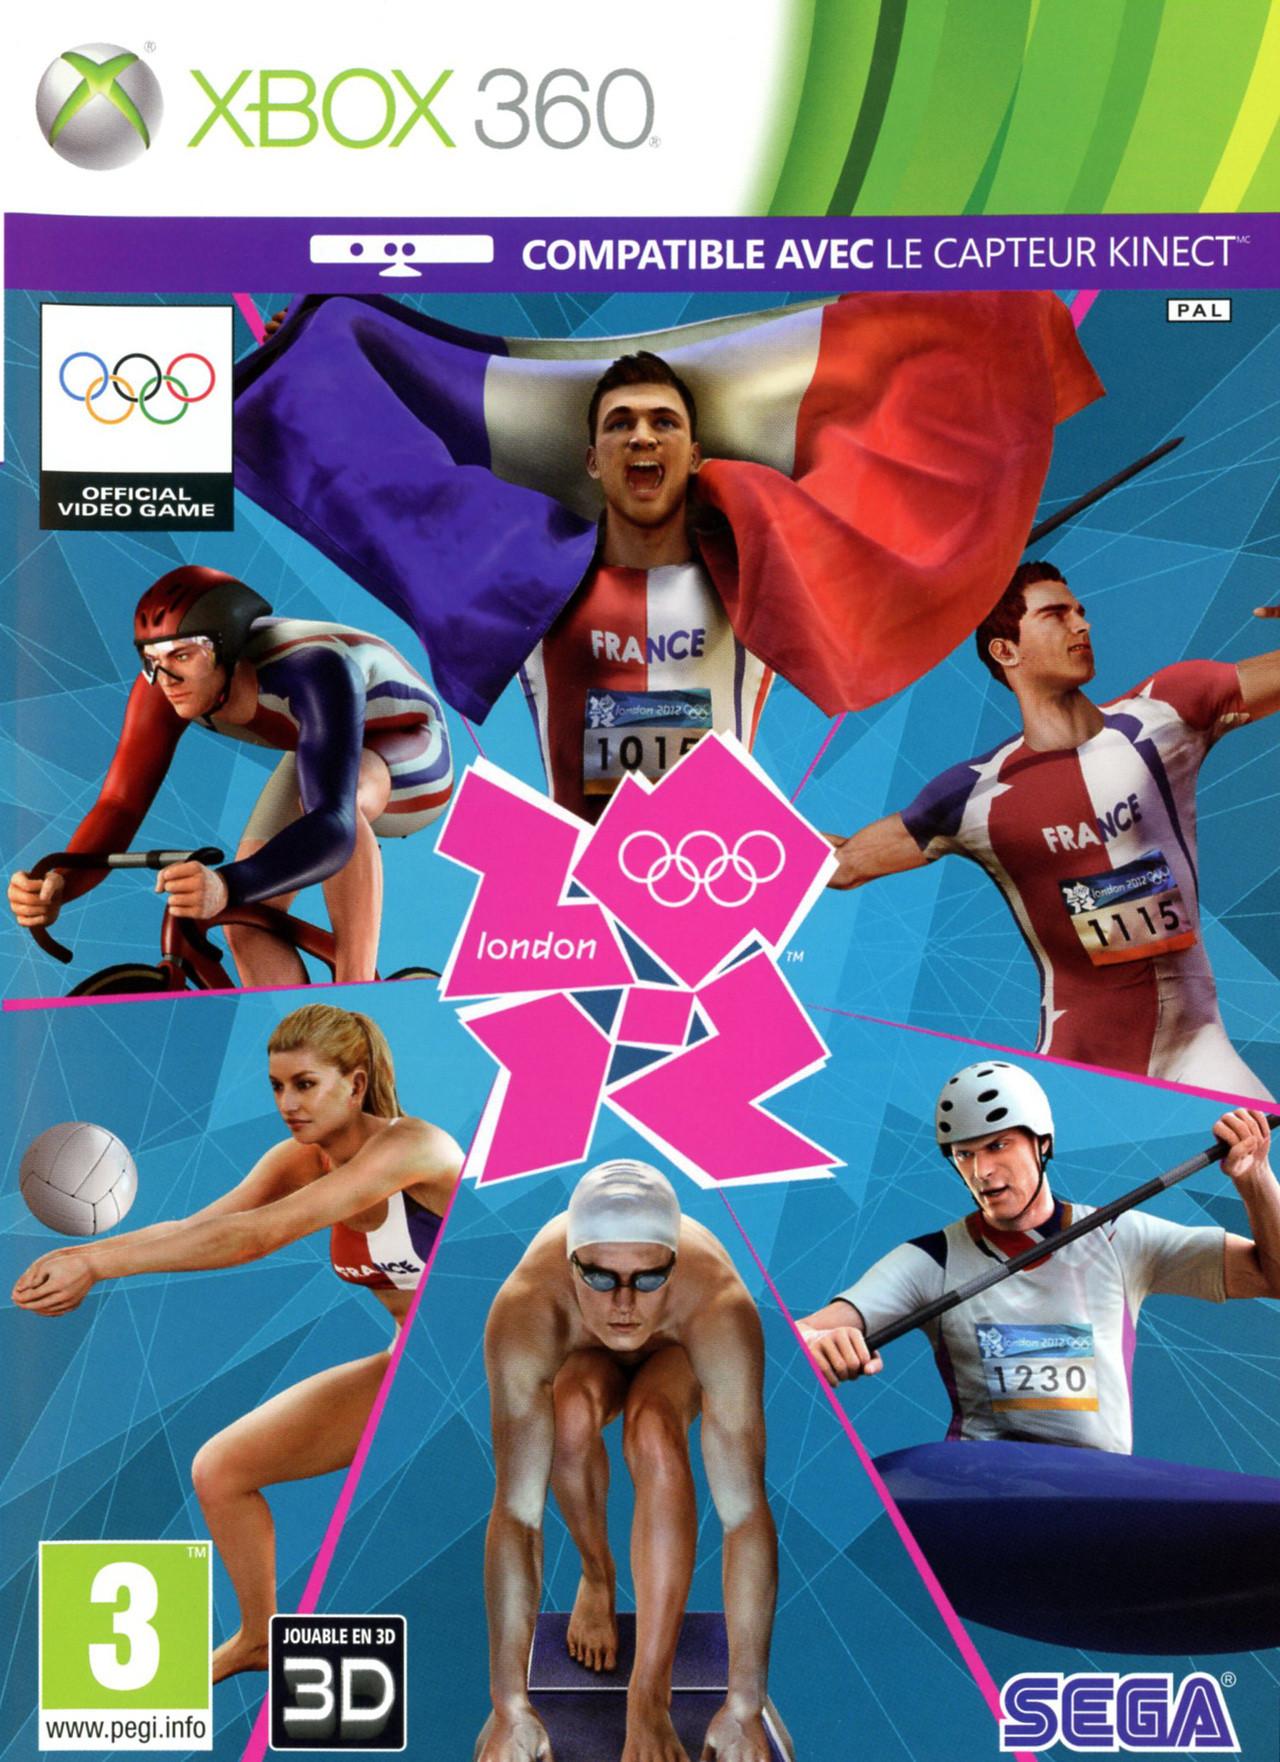 Xbox 360 London 2012 Olympics